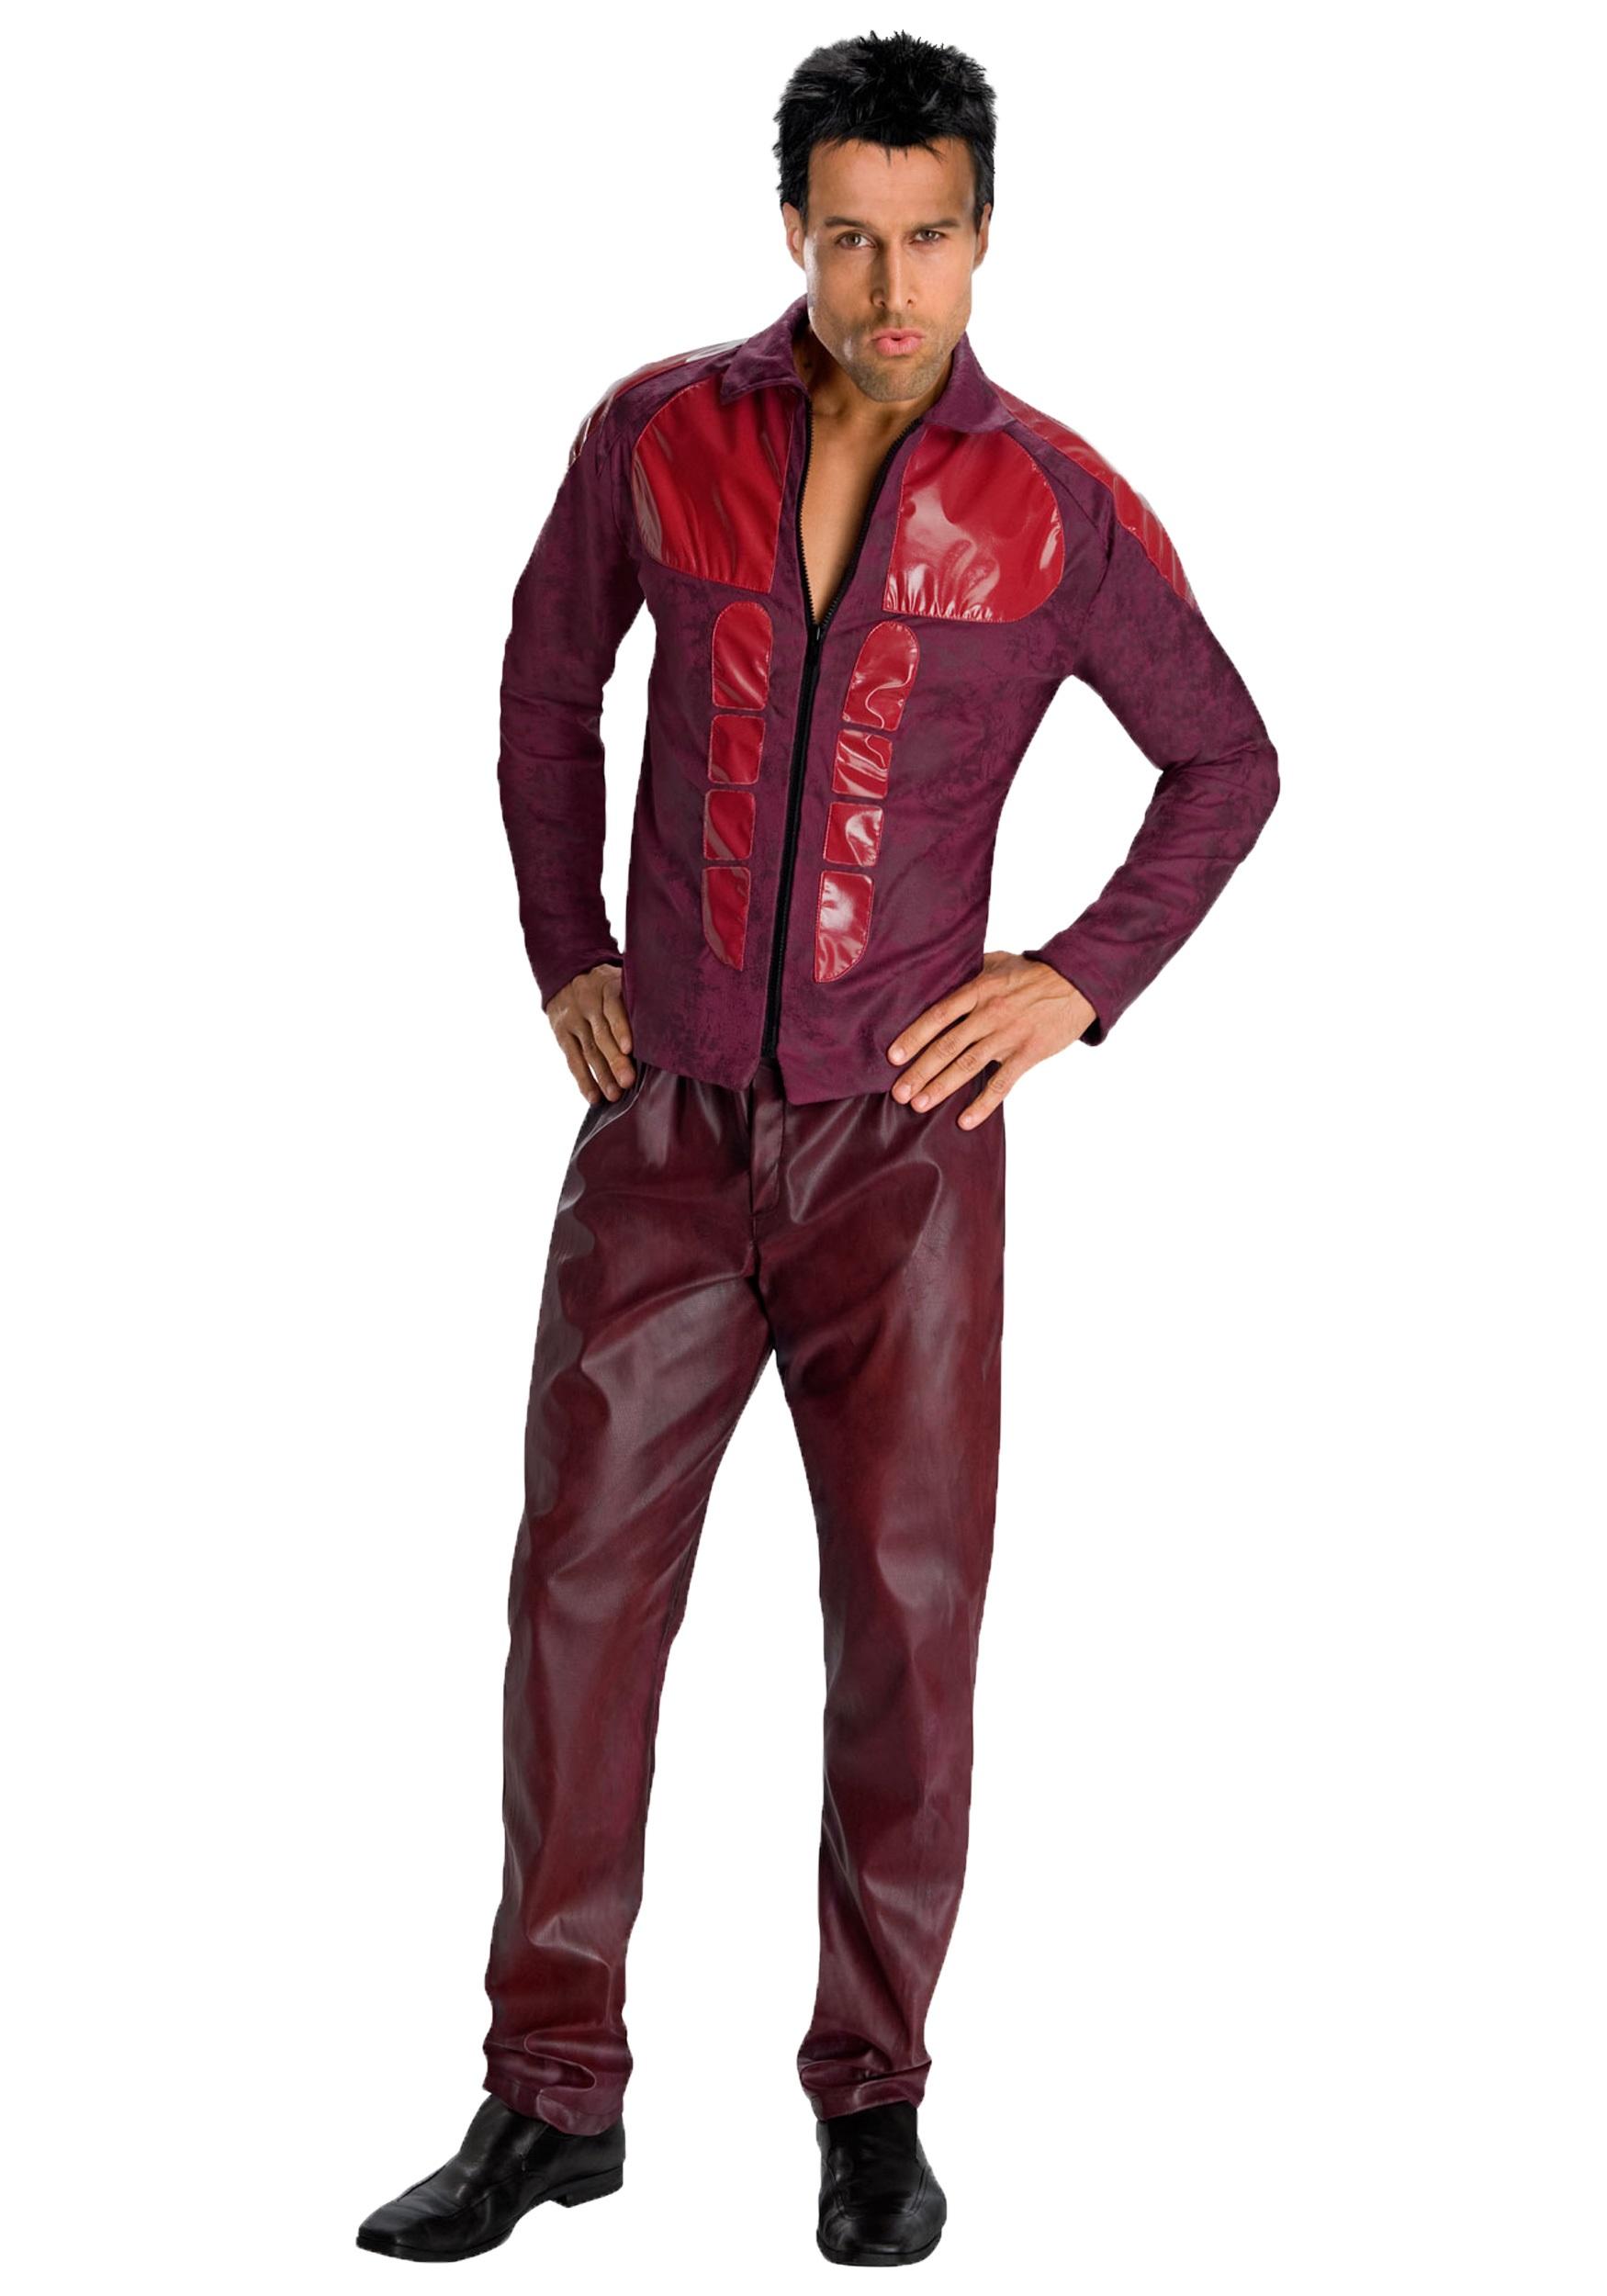 Zoolander Costumes